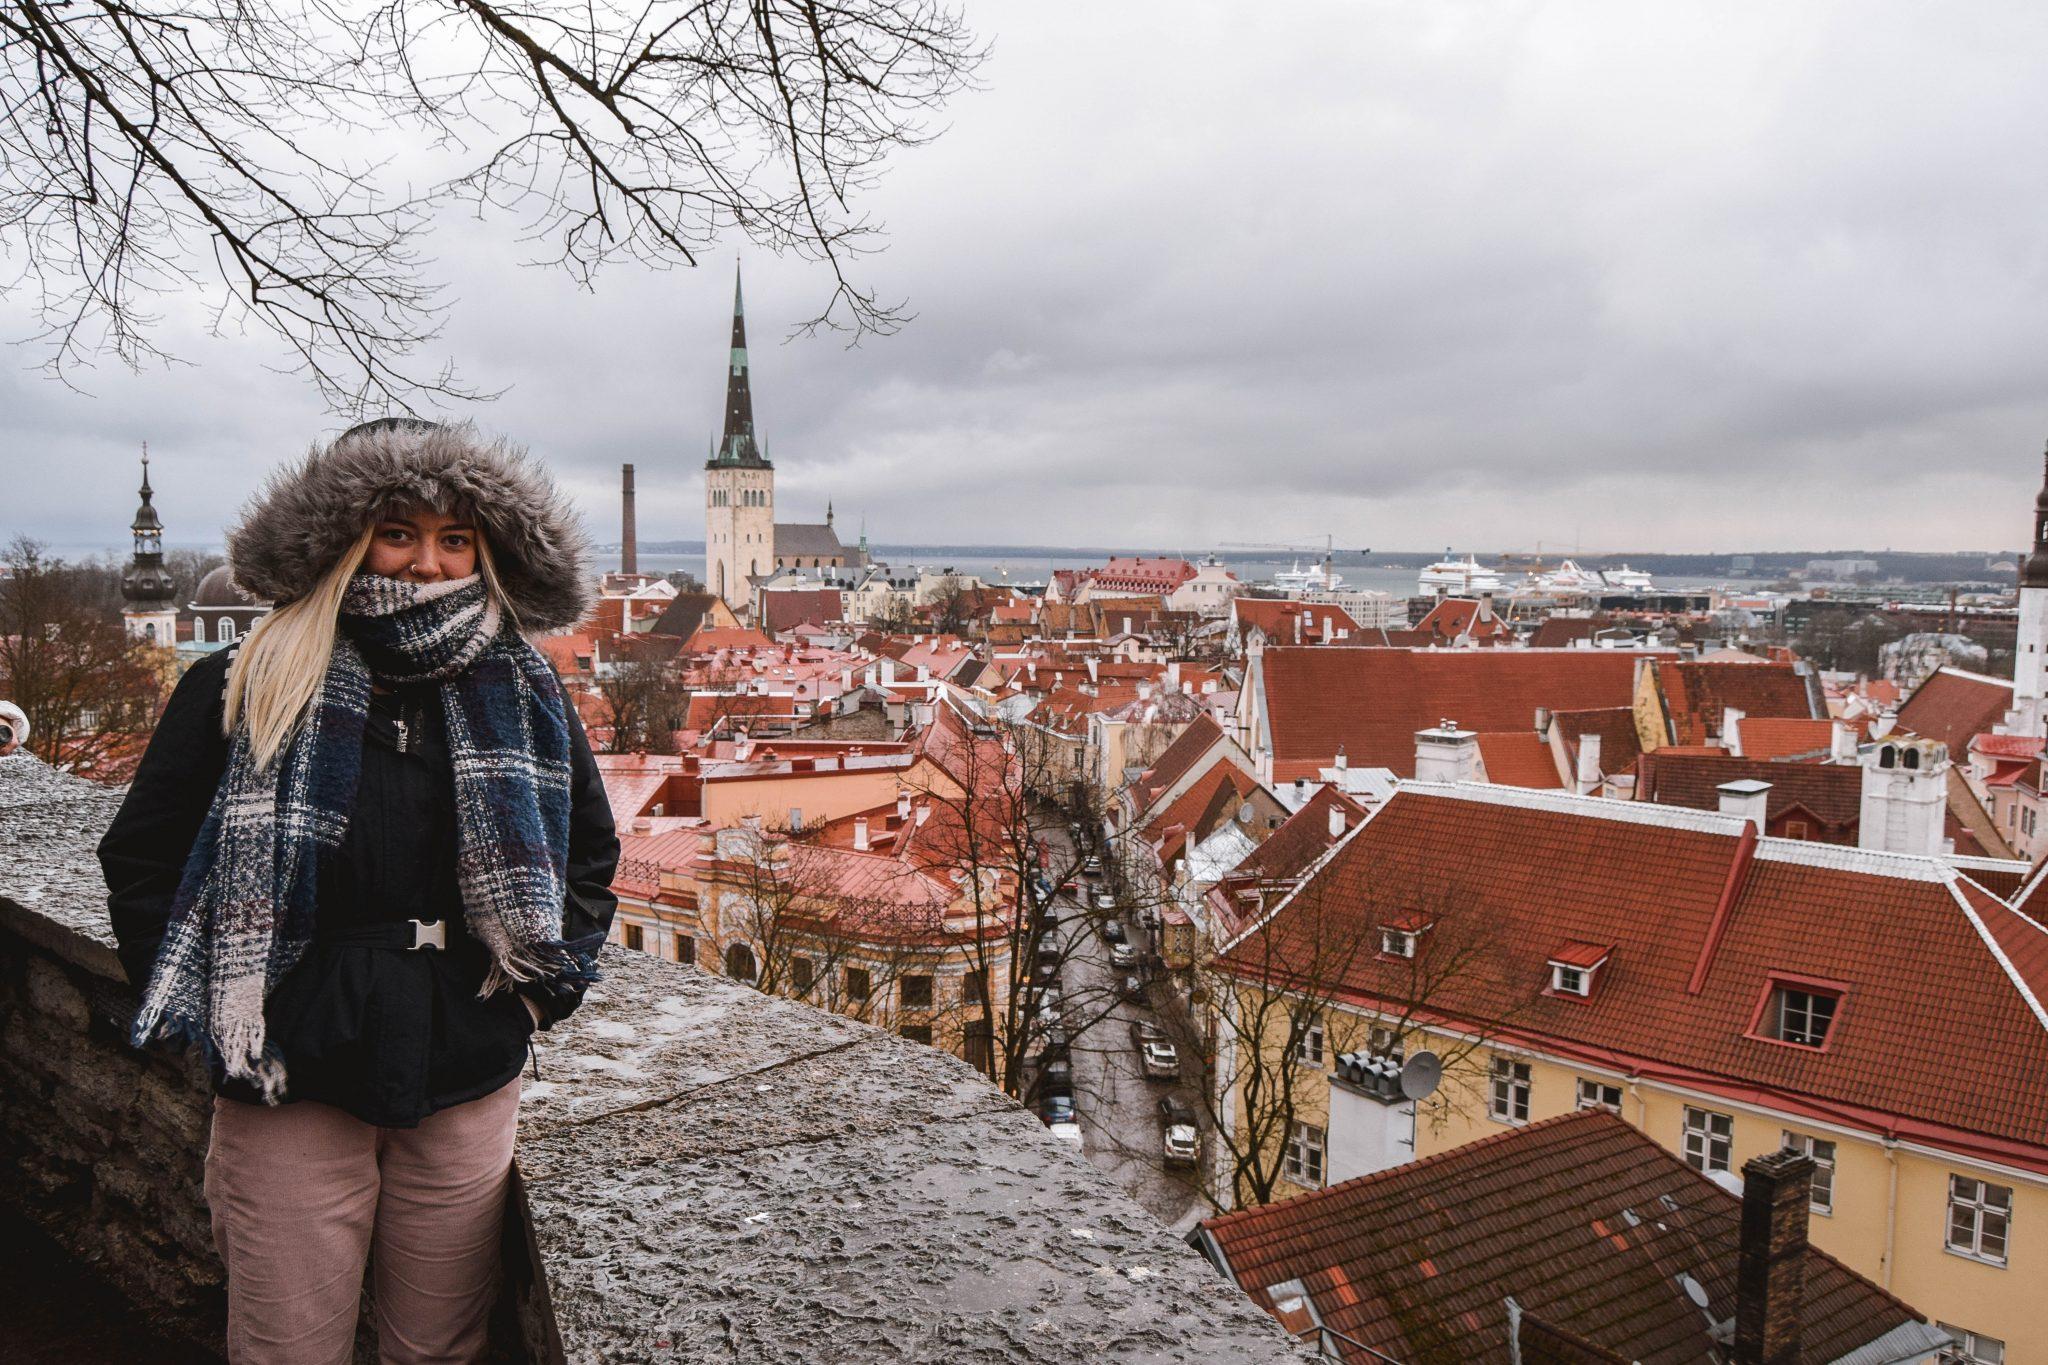 Things To Do In Tallinn In Winter Tallinn Things To Do - Kohtuotsa Viewing Platform Tallinn Estonia